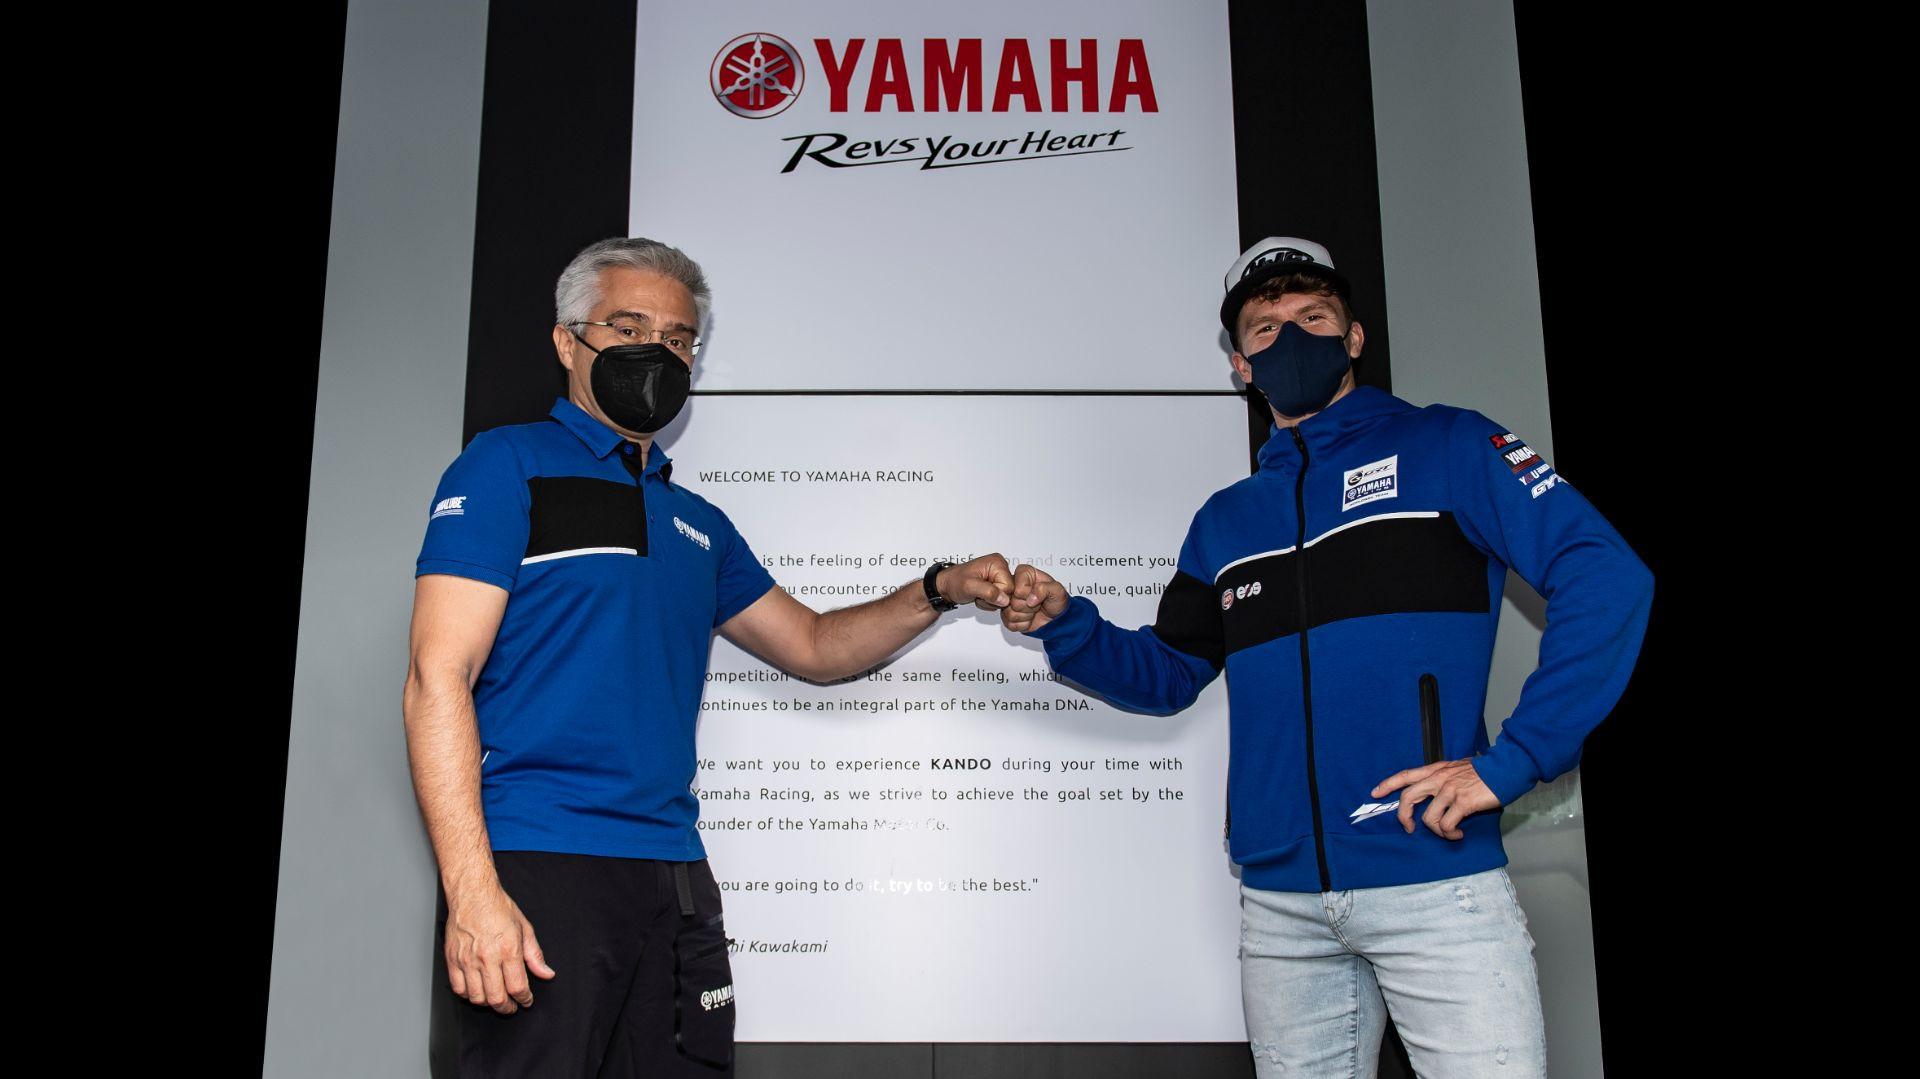 American Garrett Gerloff (right) with Andrea Dosoli, Road Racing Manager, Yamaha Motor Europe (right). Photo courtesy Yamaha Racing.